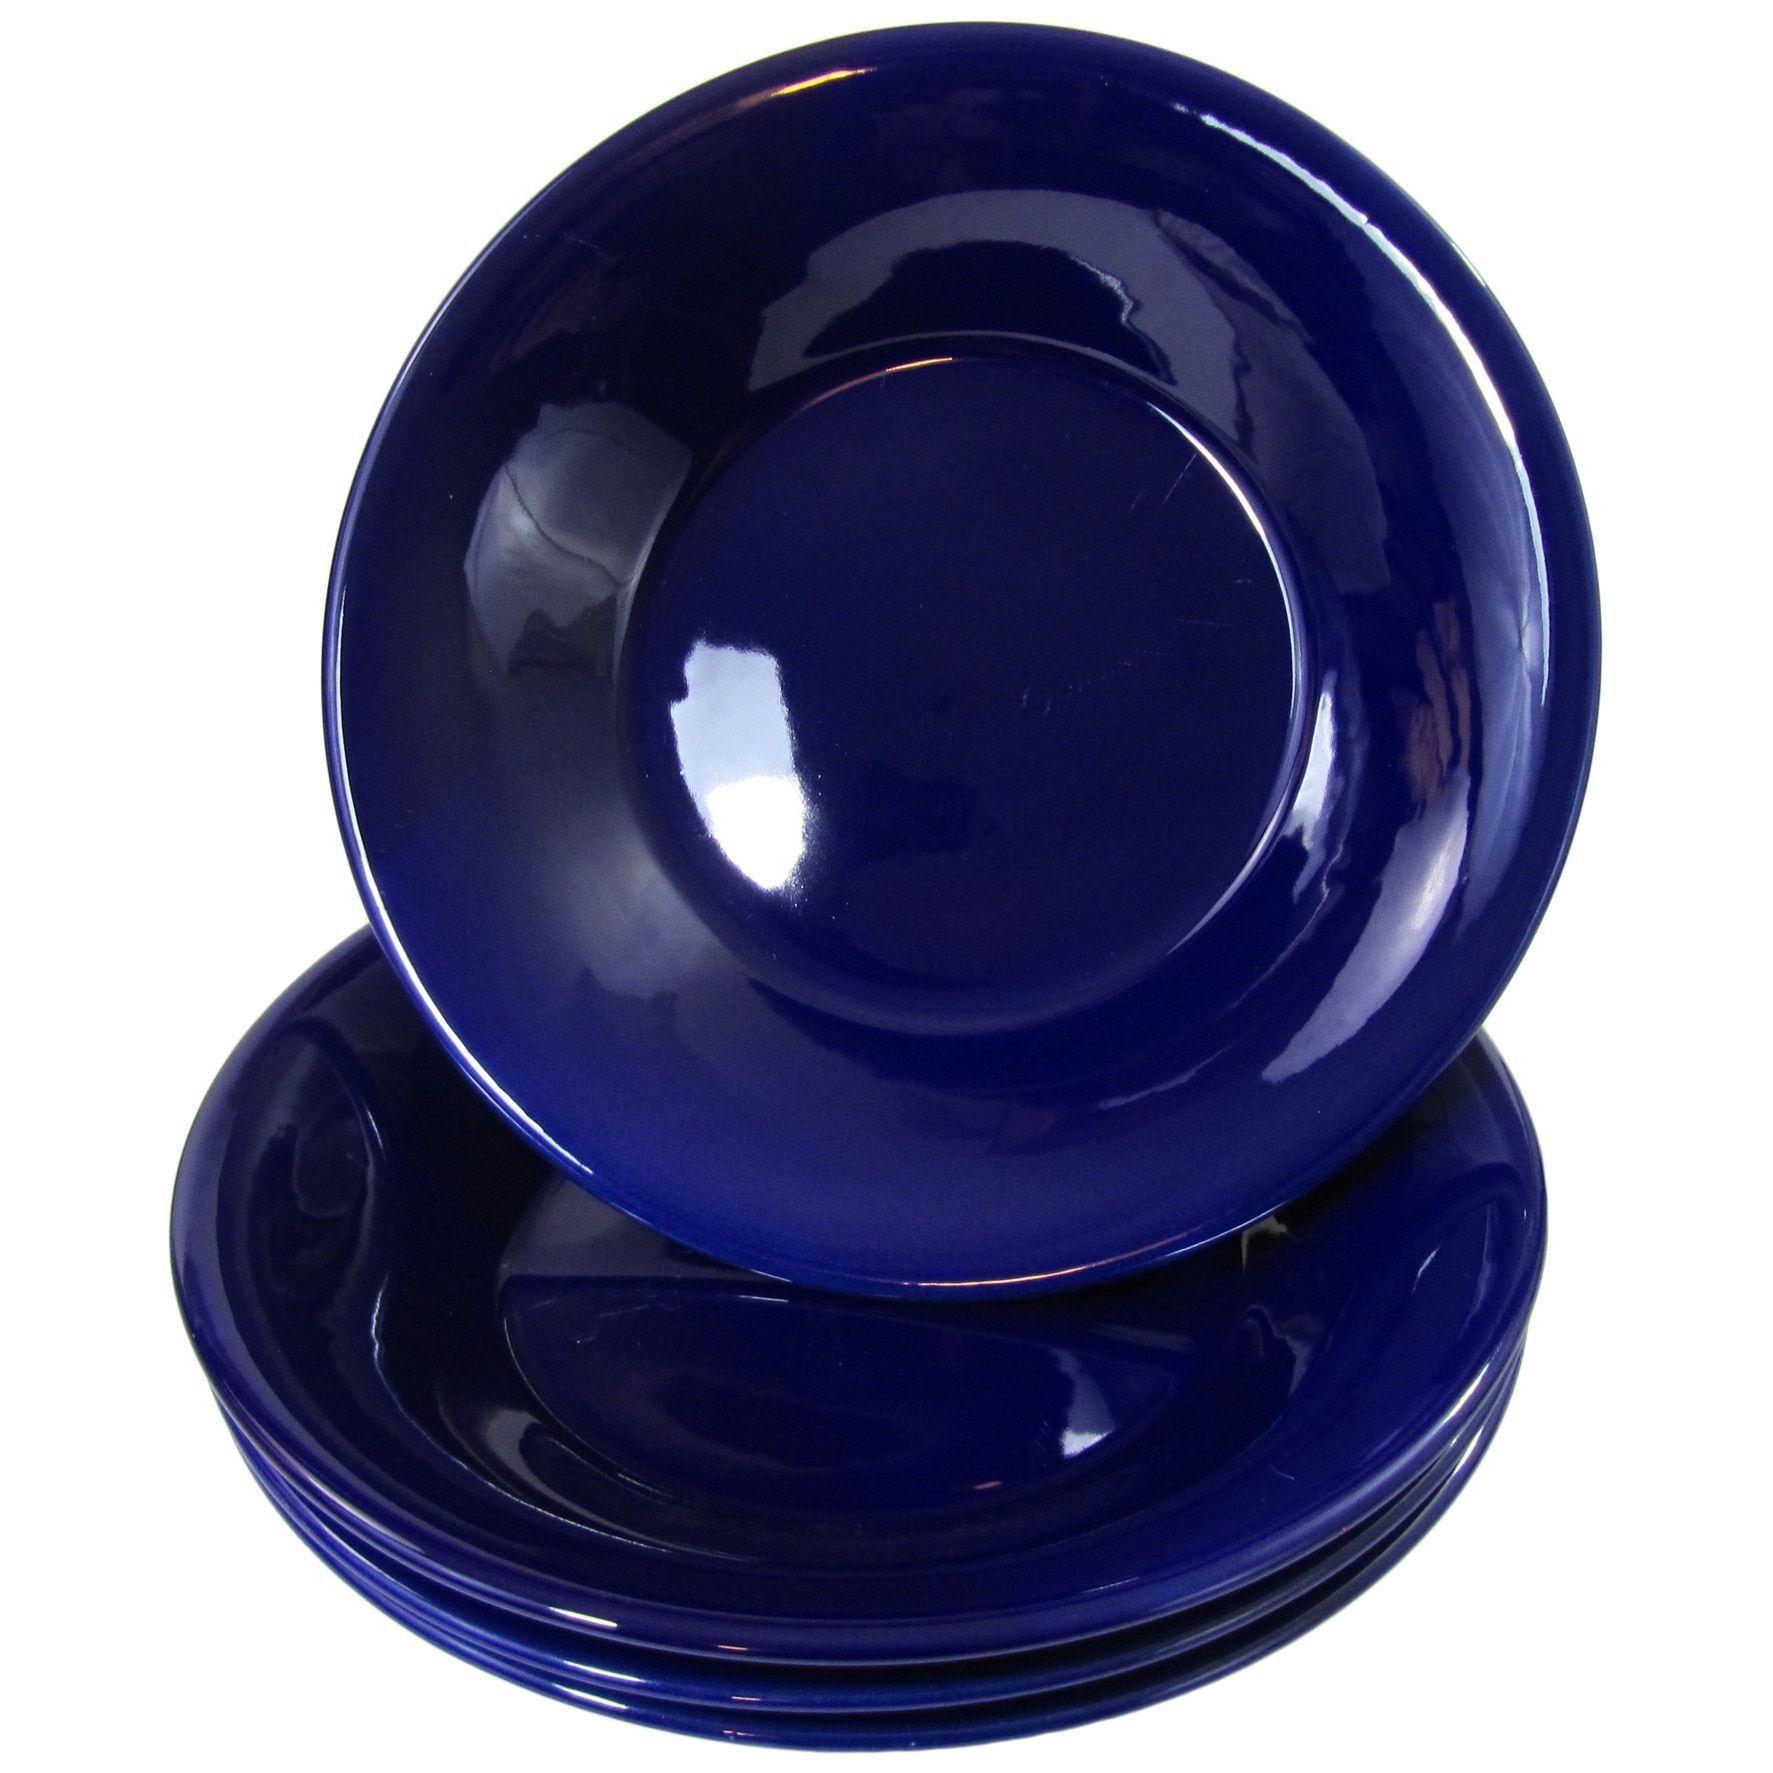 Le Souk Ceramique UBLU39 Stoneware Salad/Pasta Bowls, Set of 4, Solid